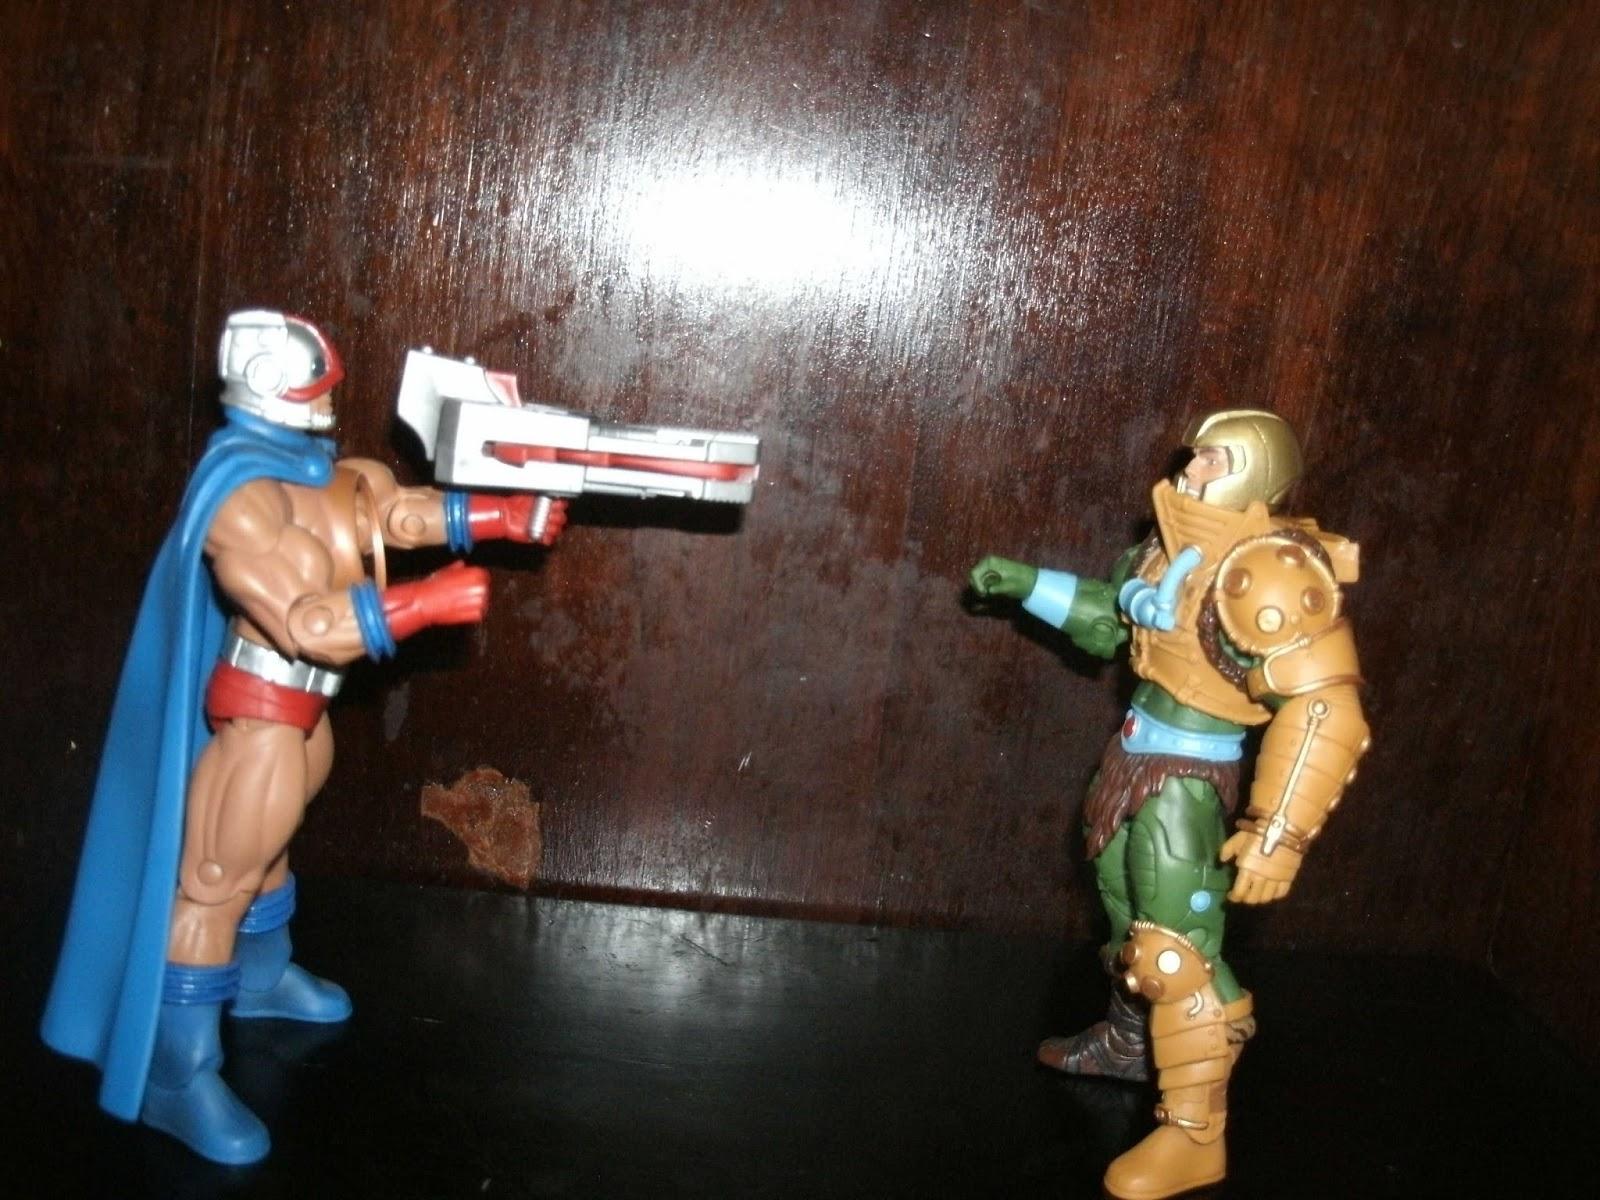 Sincere 10 X He-man Motu Figurine Leg-repair Bands Tv, Movies & Video Games Toys & Games